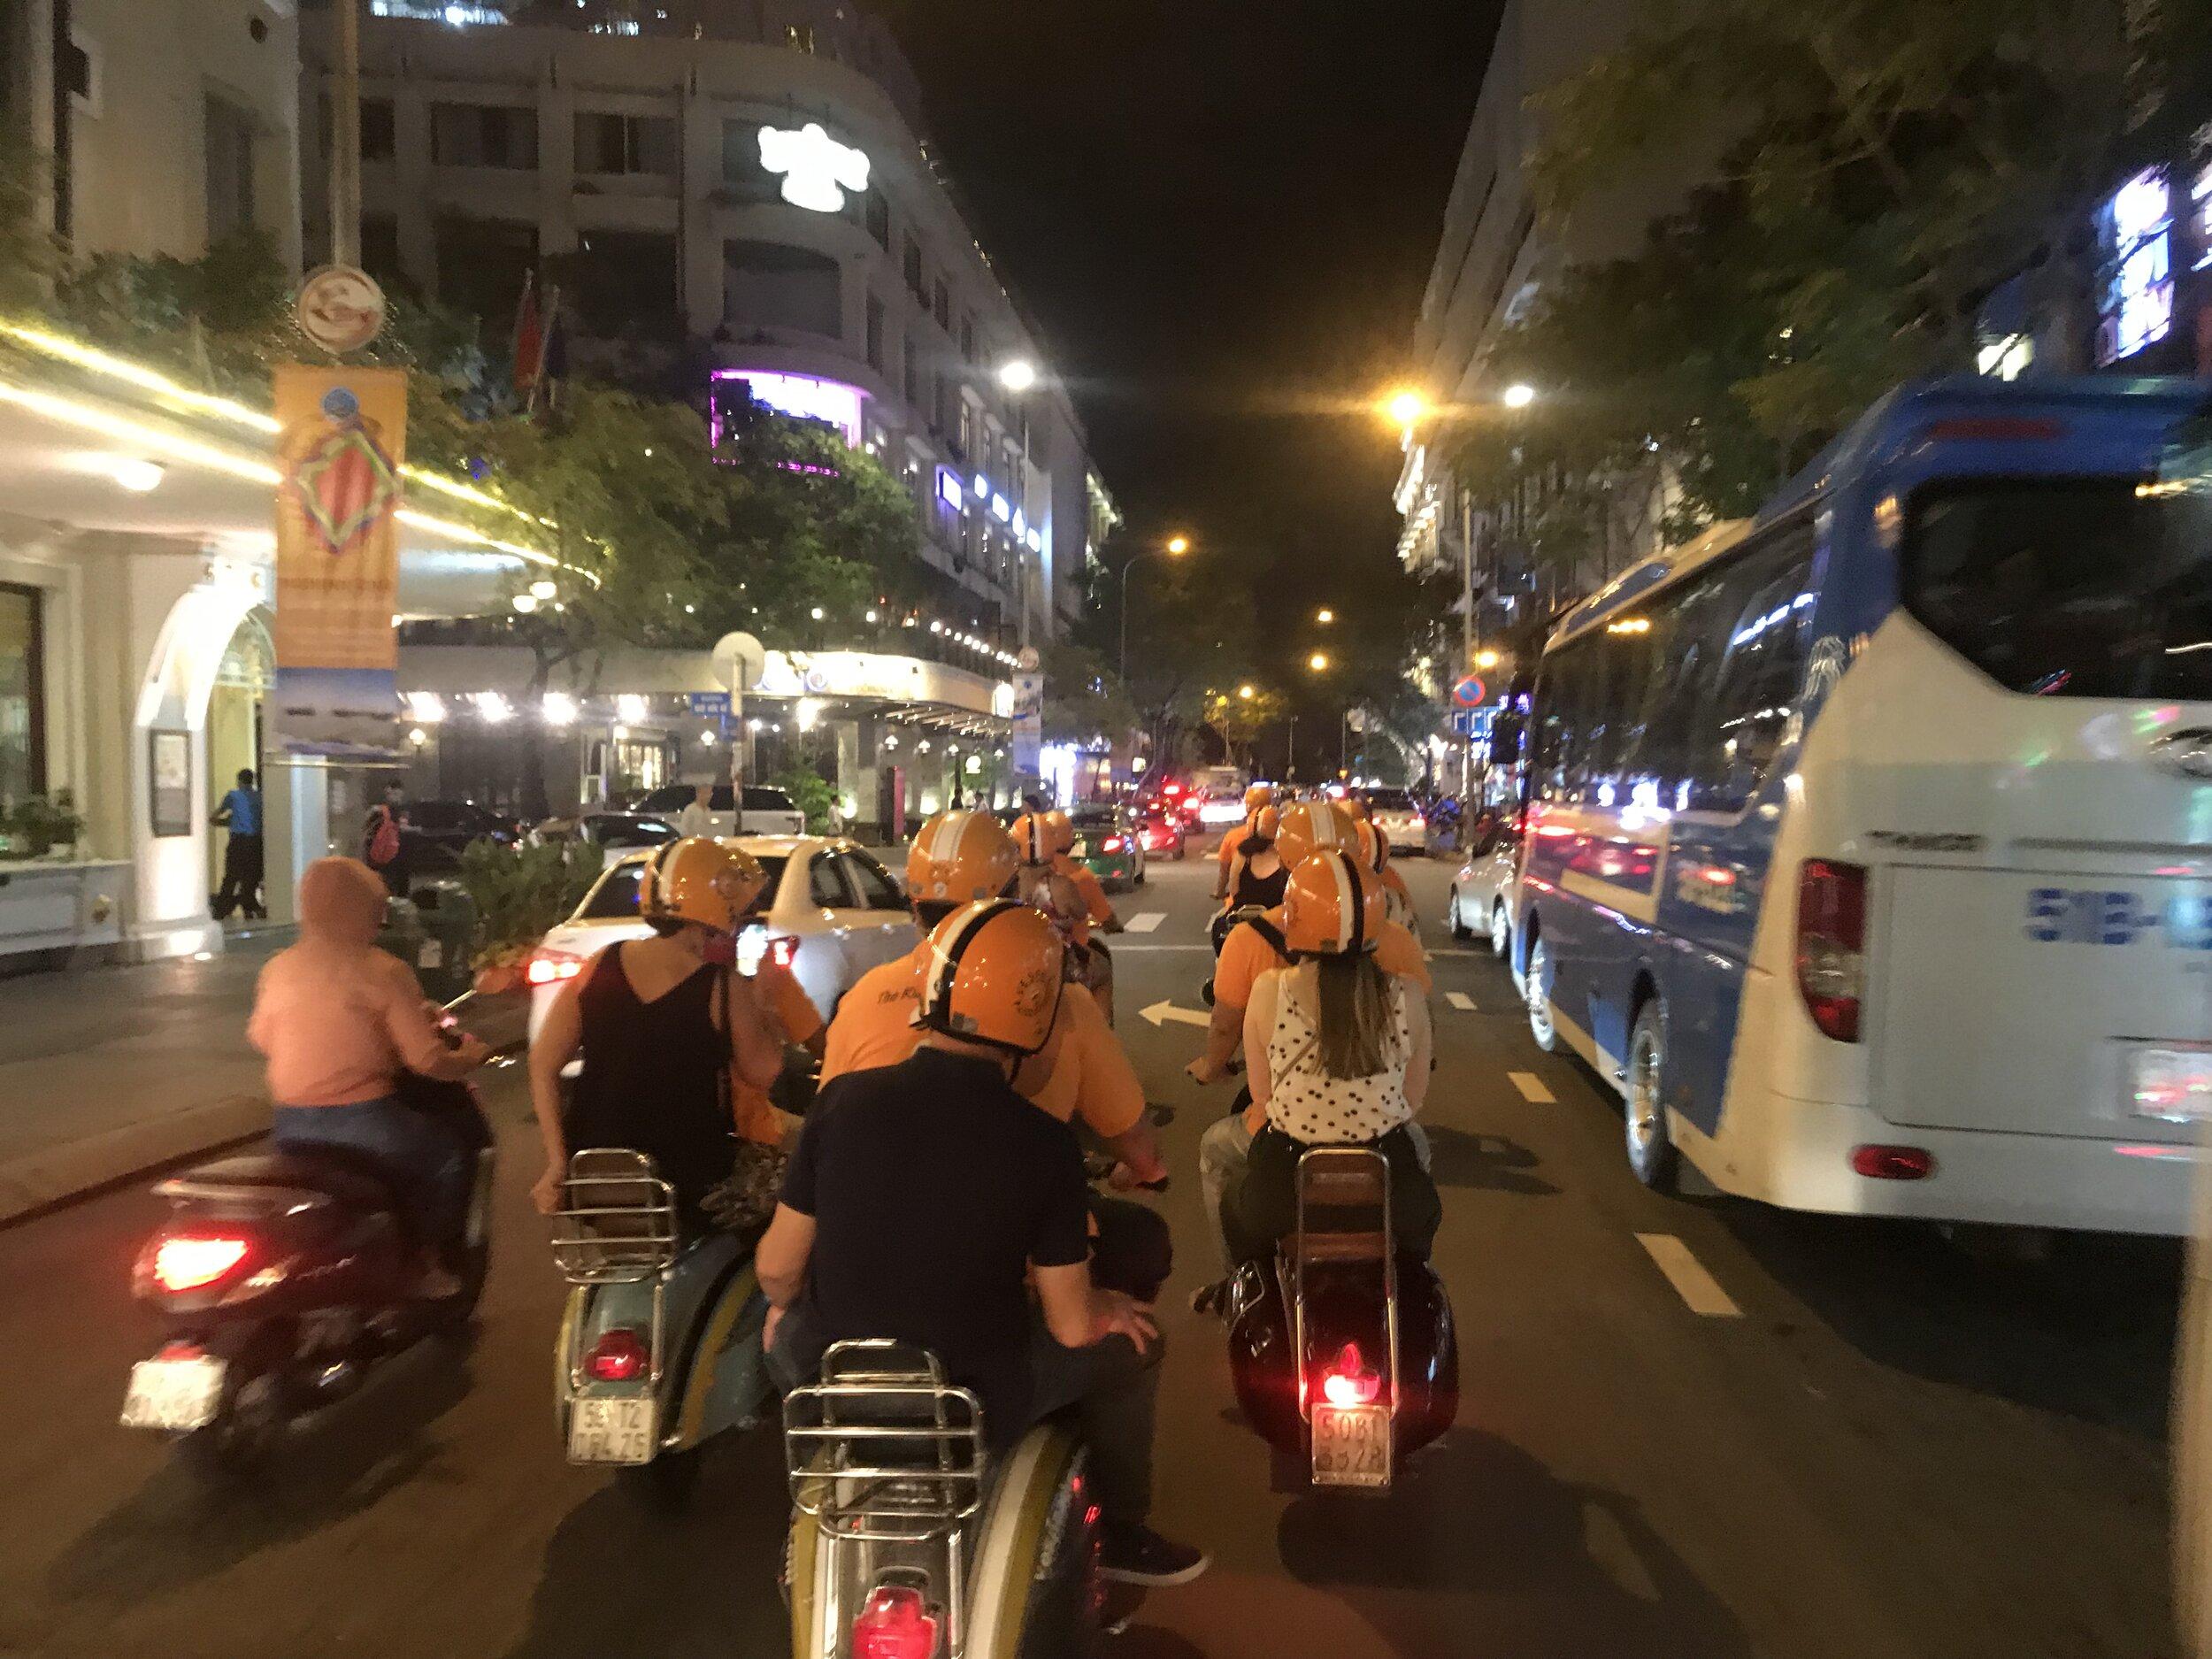 Scooting Through the streets of Saigon